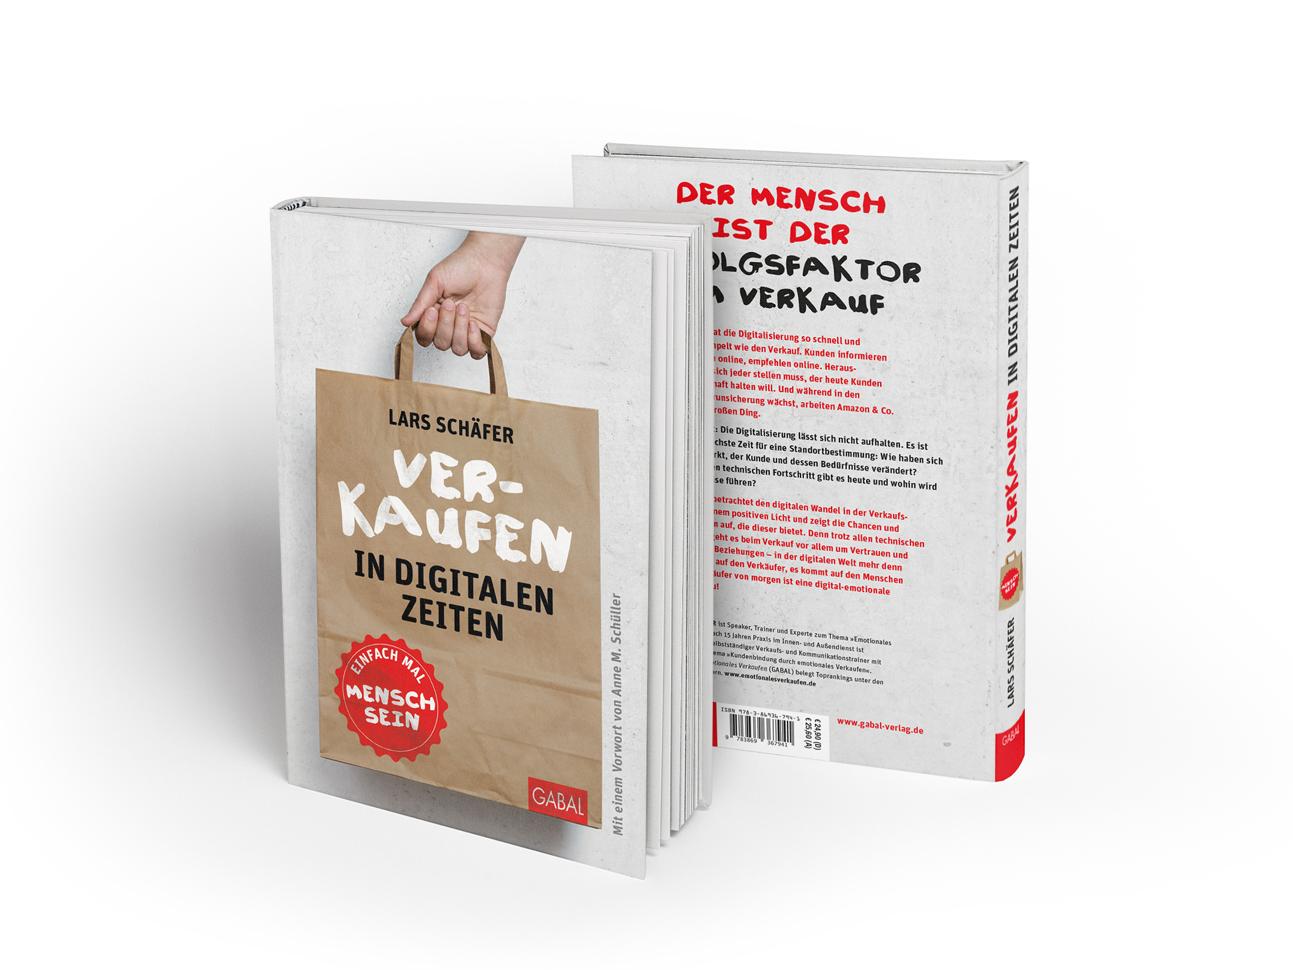 martin zech design, buchcover design, lars schaefer, verkaufen in digitalen zeiten